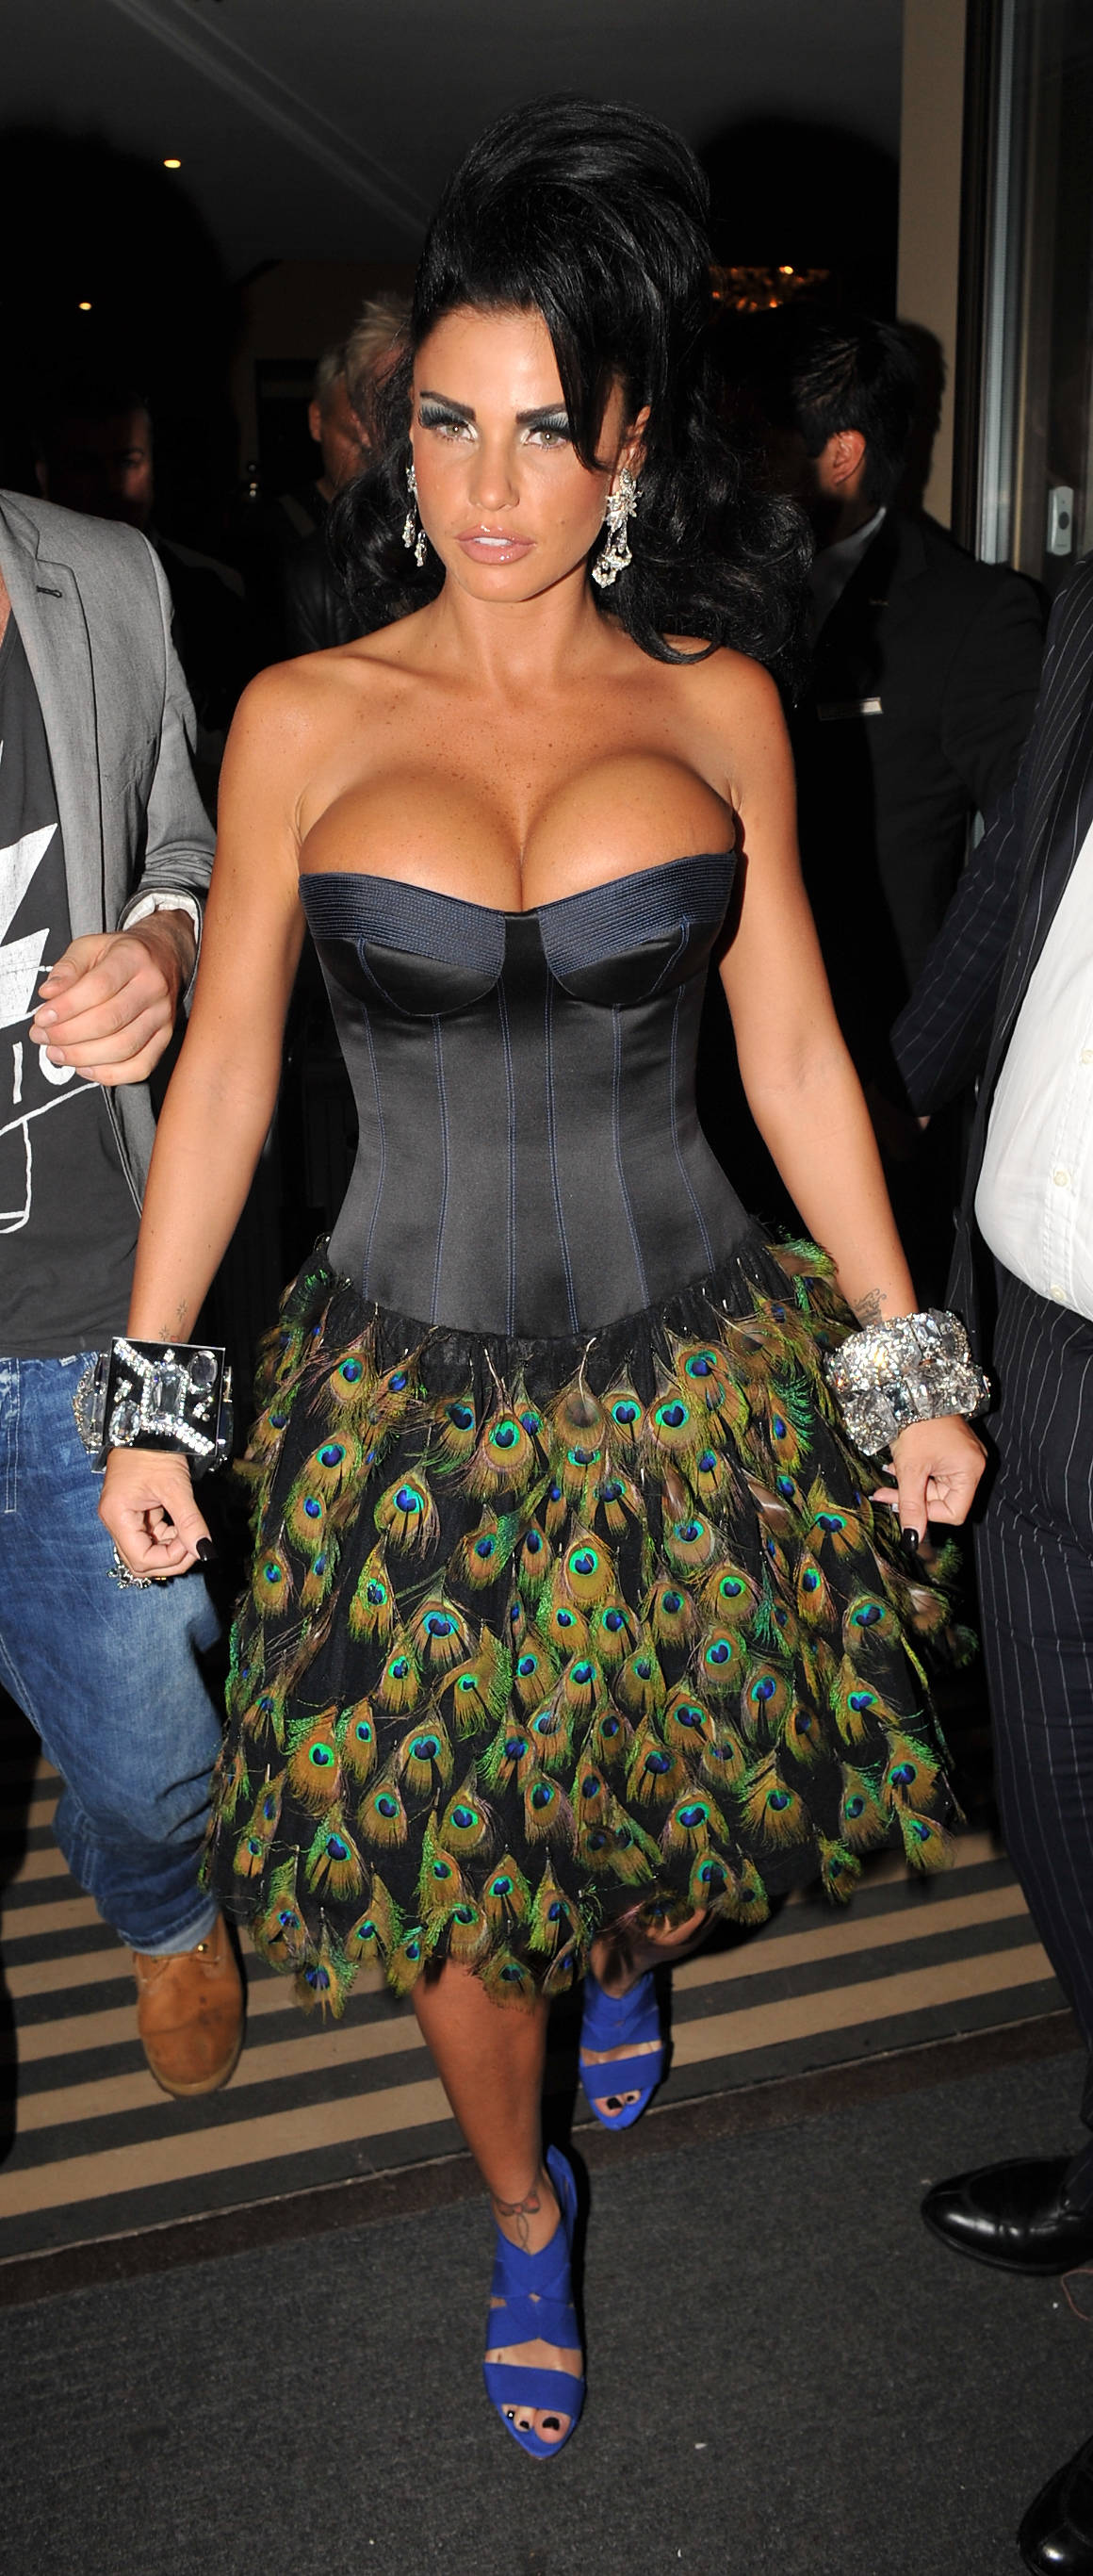 fit boobs